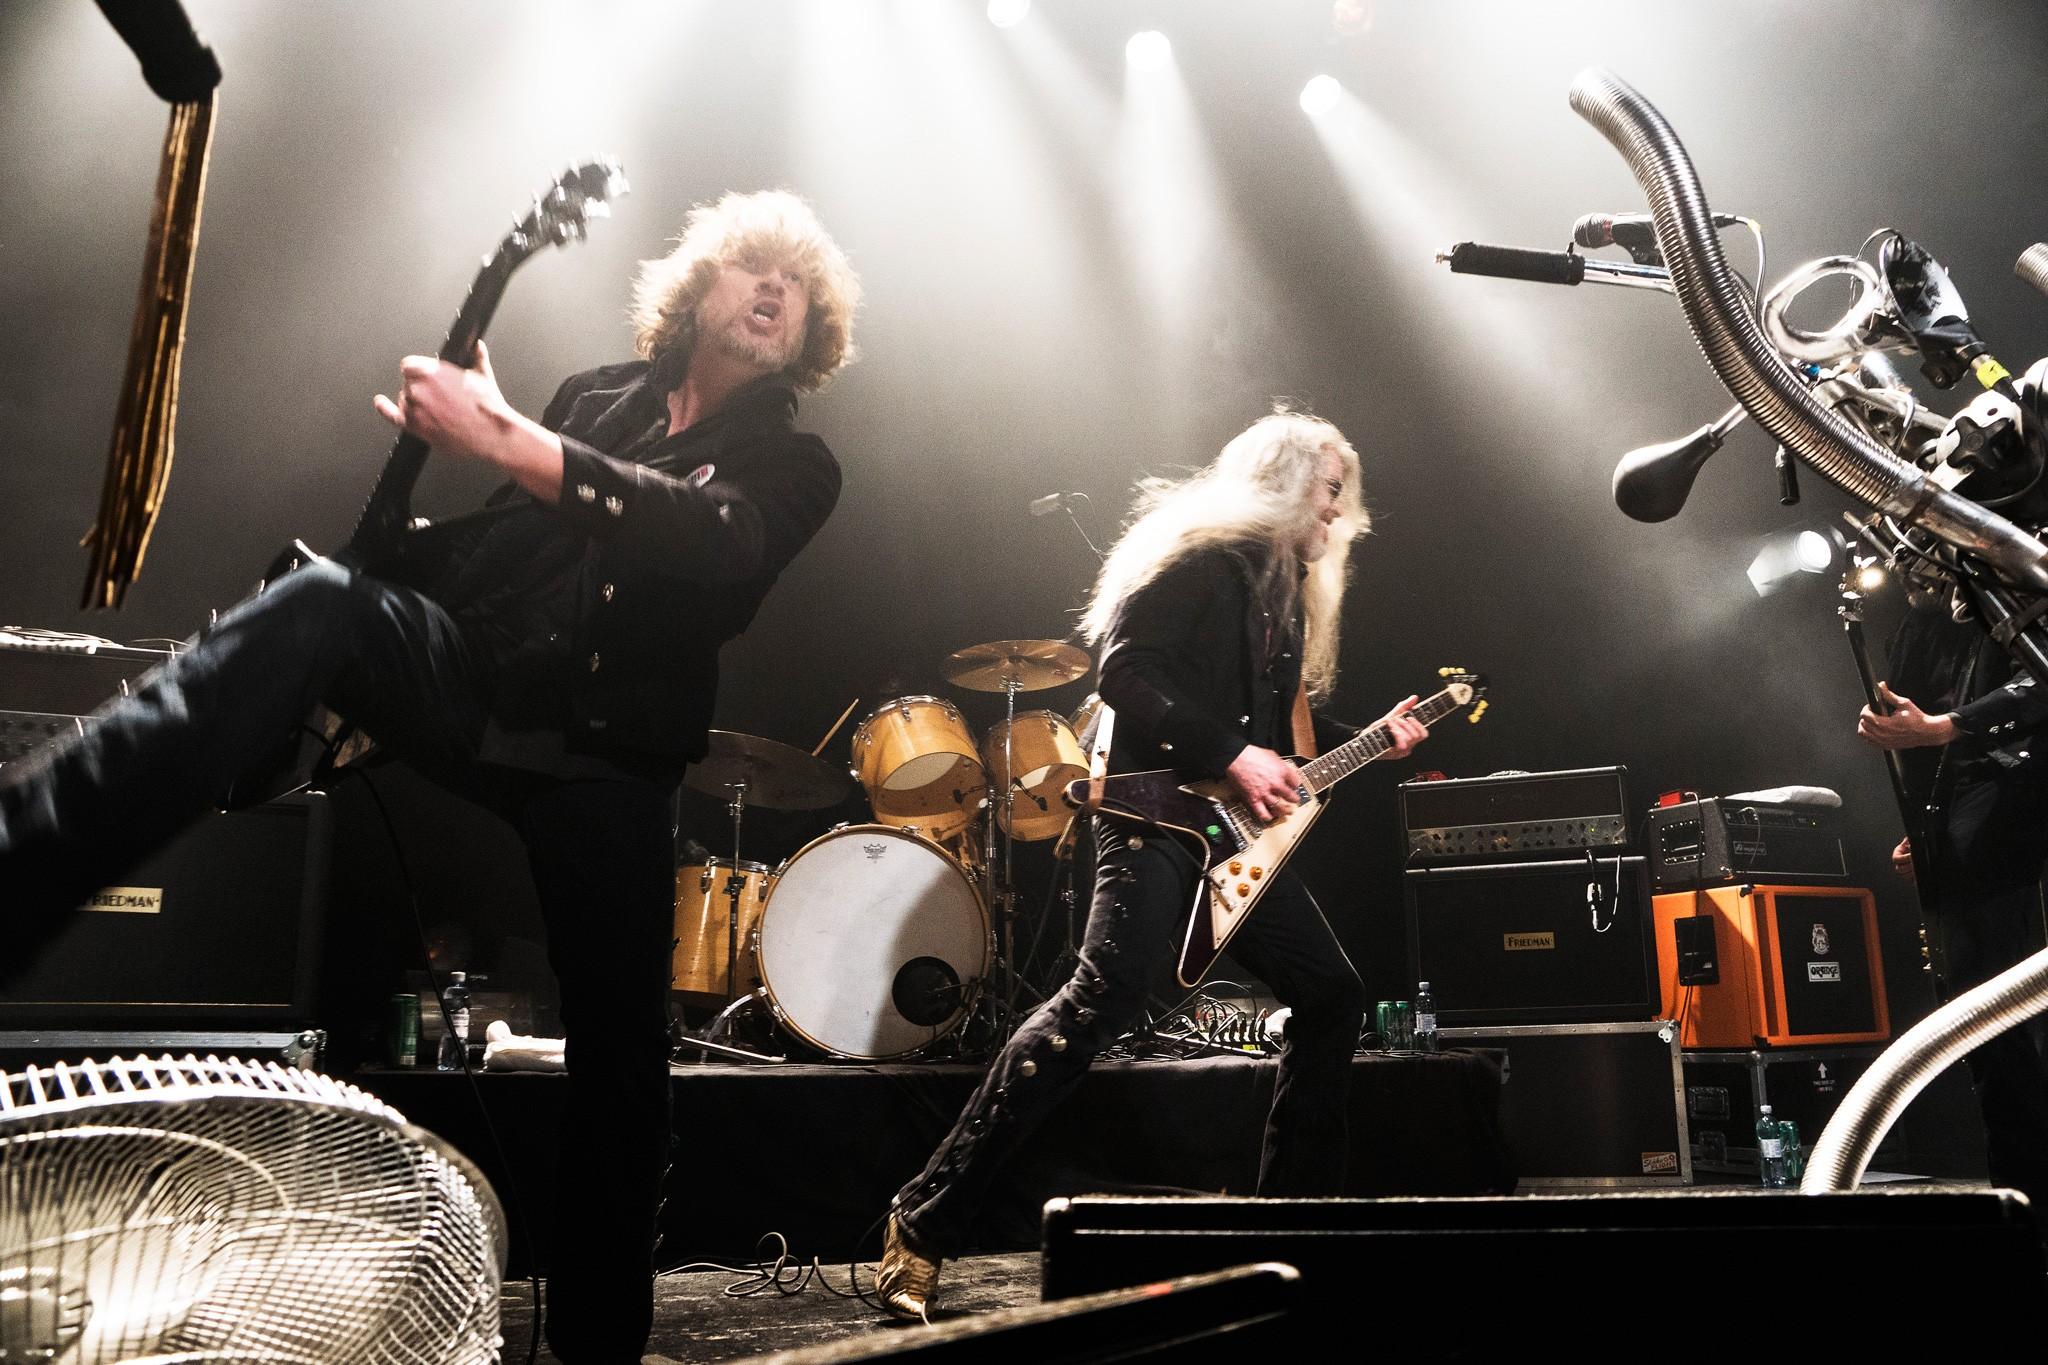 Aslag Guttormsgaard & Lars Lønning, Black Debbath